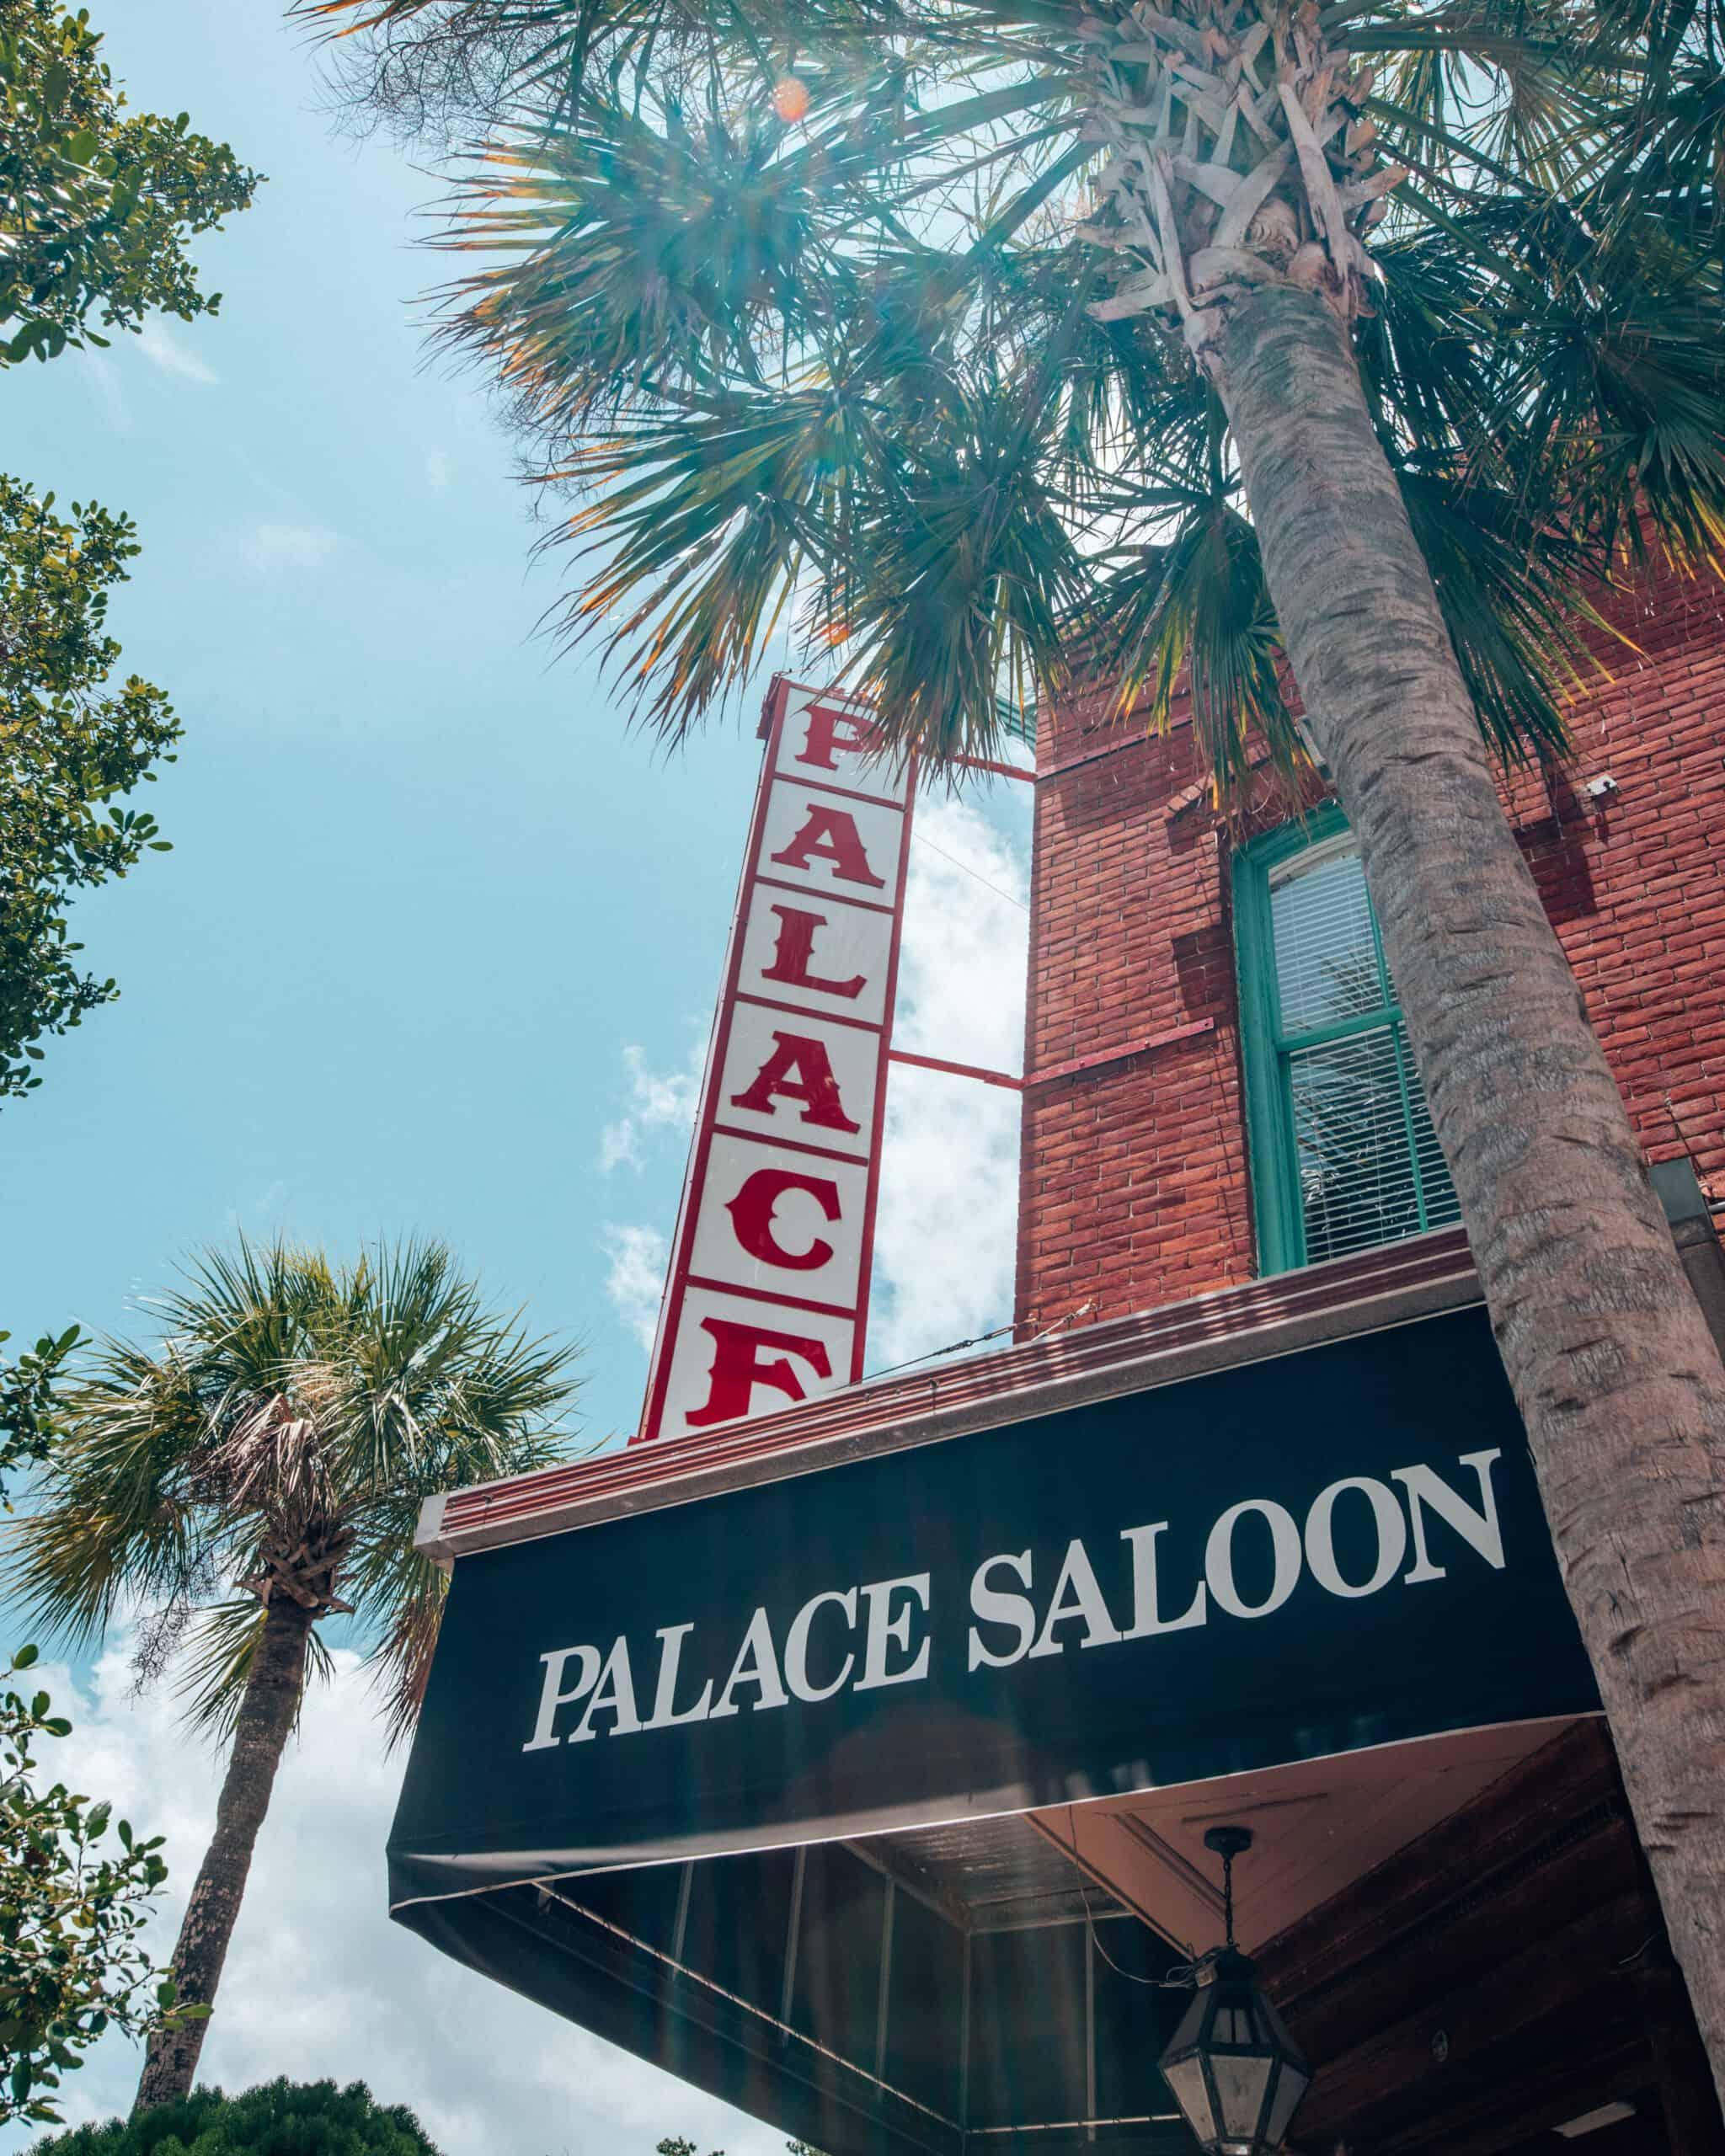 Palace Saloon Fernandina Beach